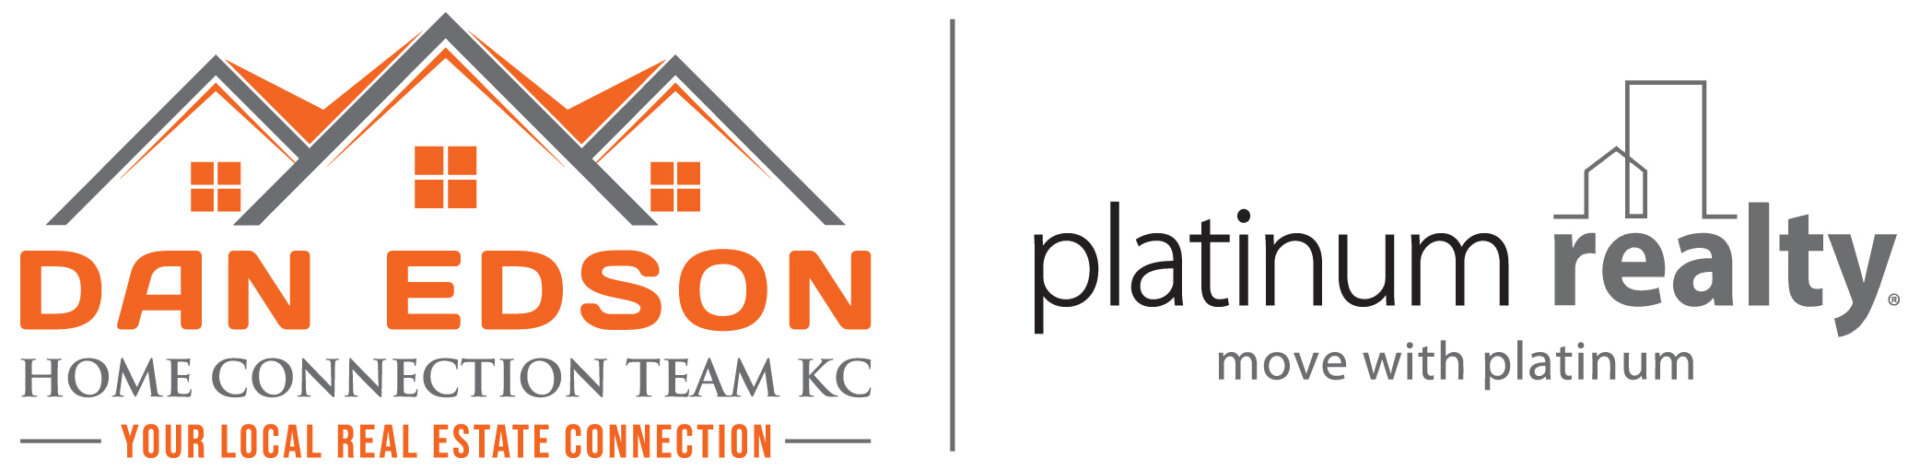 Dan Edson, Home Connection Team KC logo